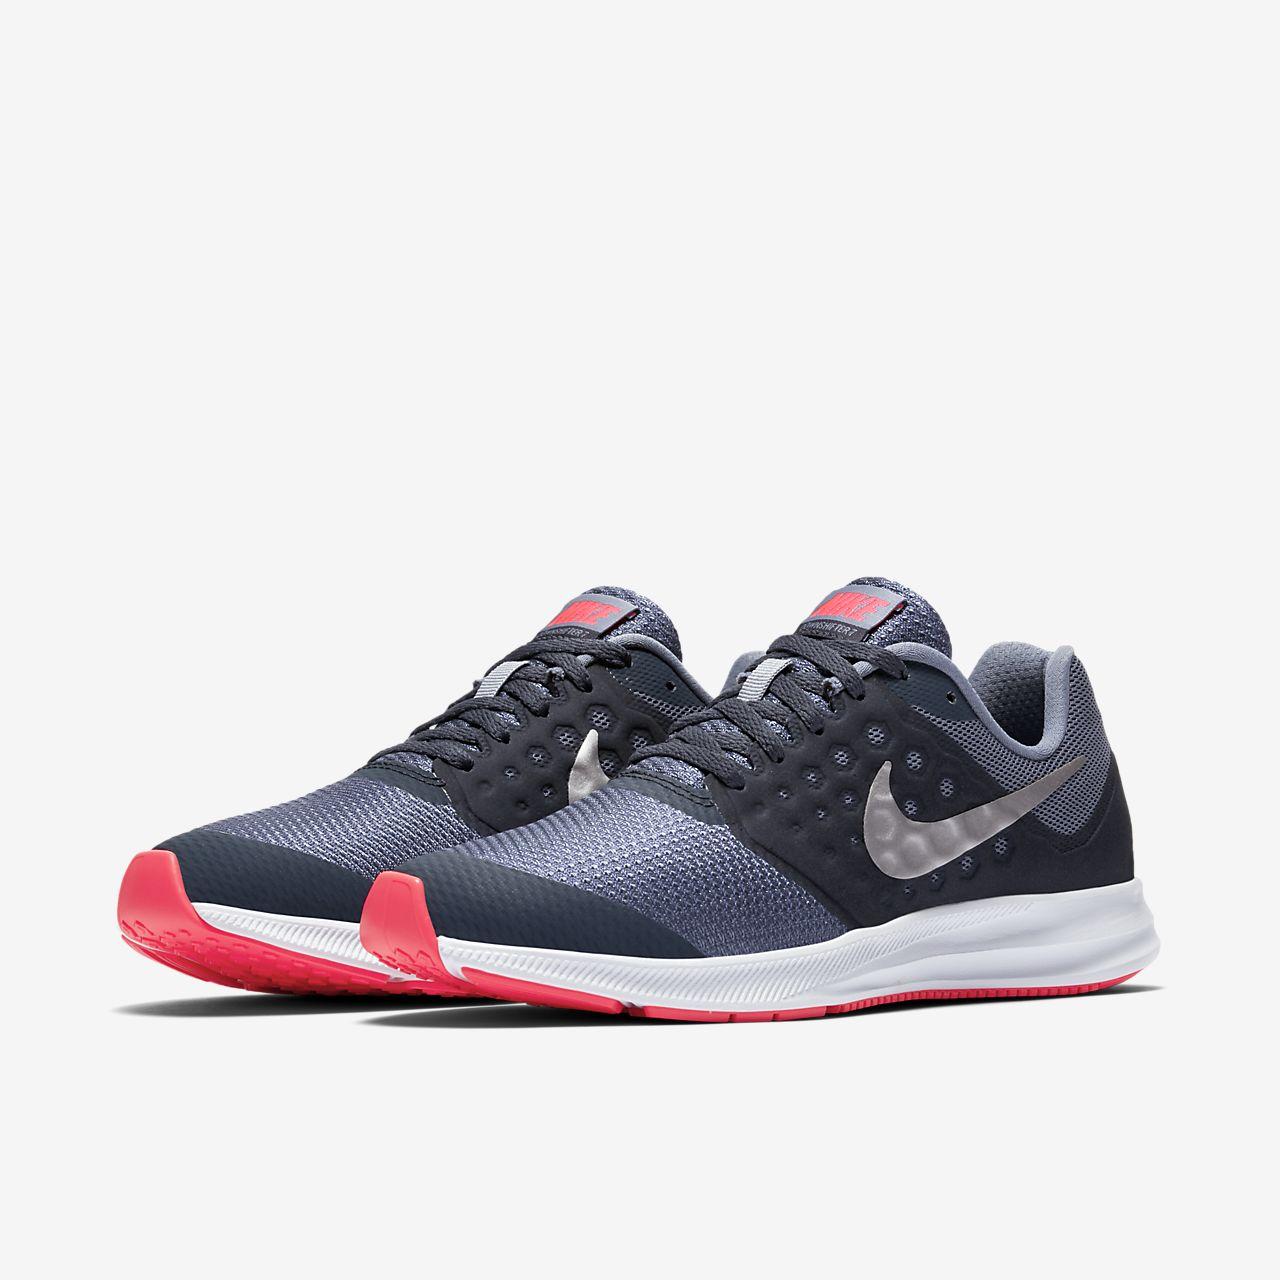 993925c529982 Nike Downshifter 7 Older Kids  Running Shoe. Nike.com AU